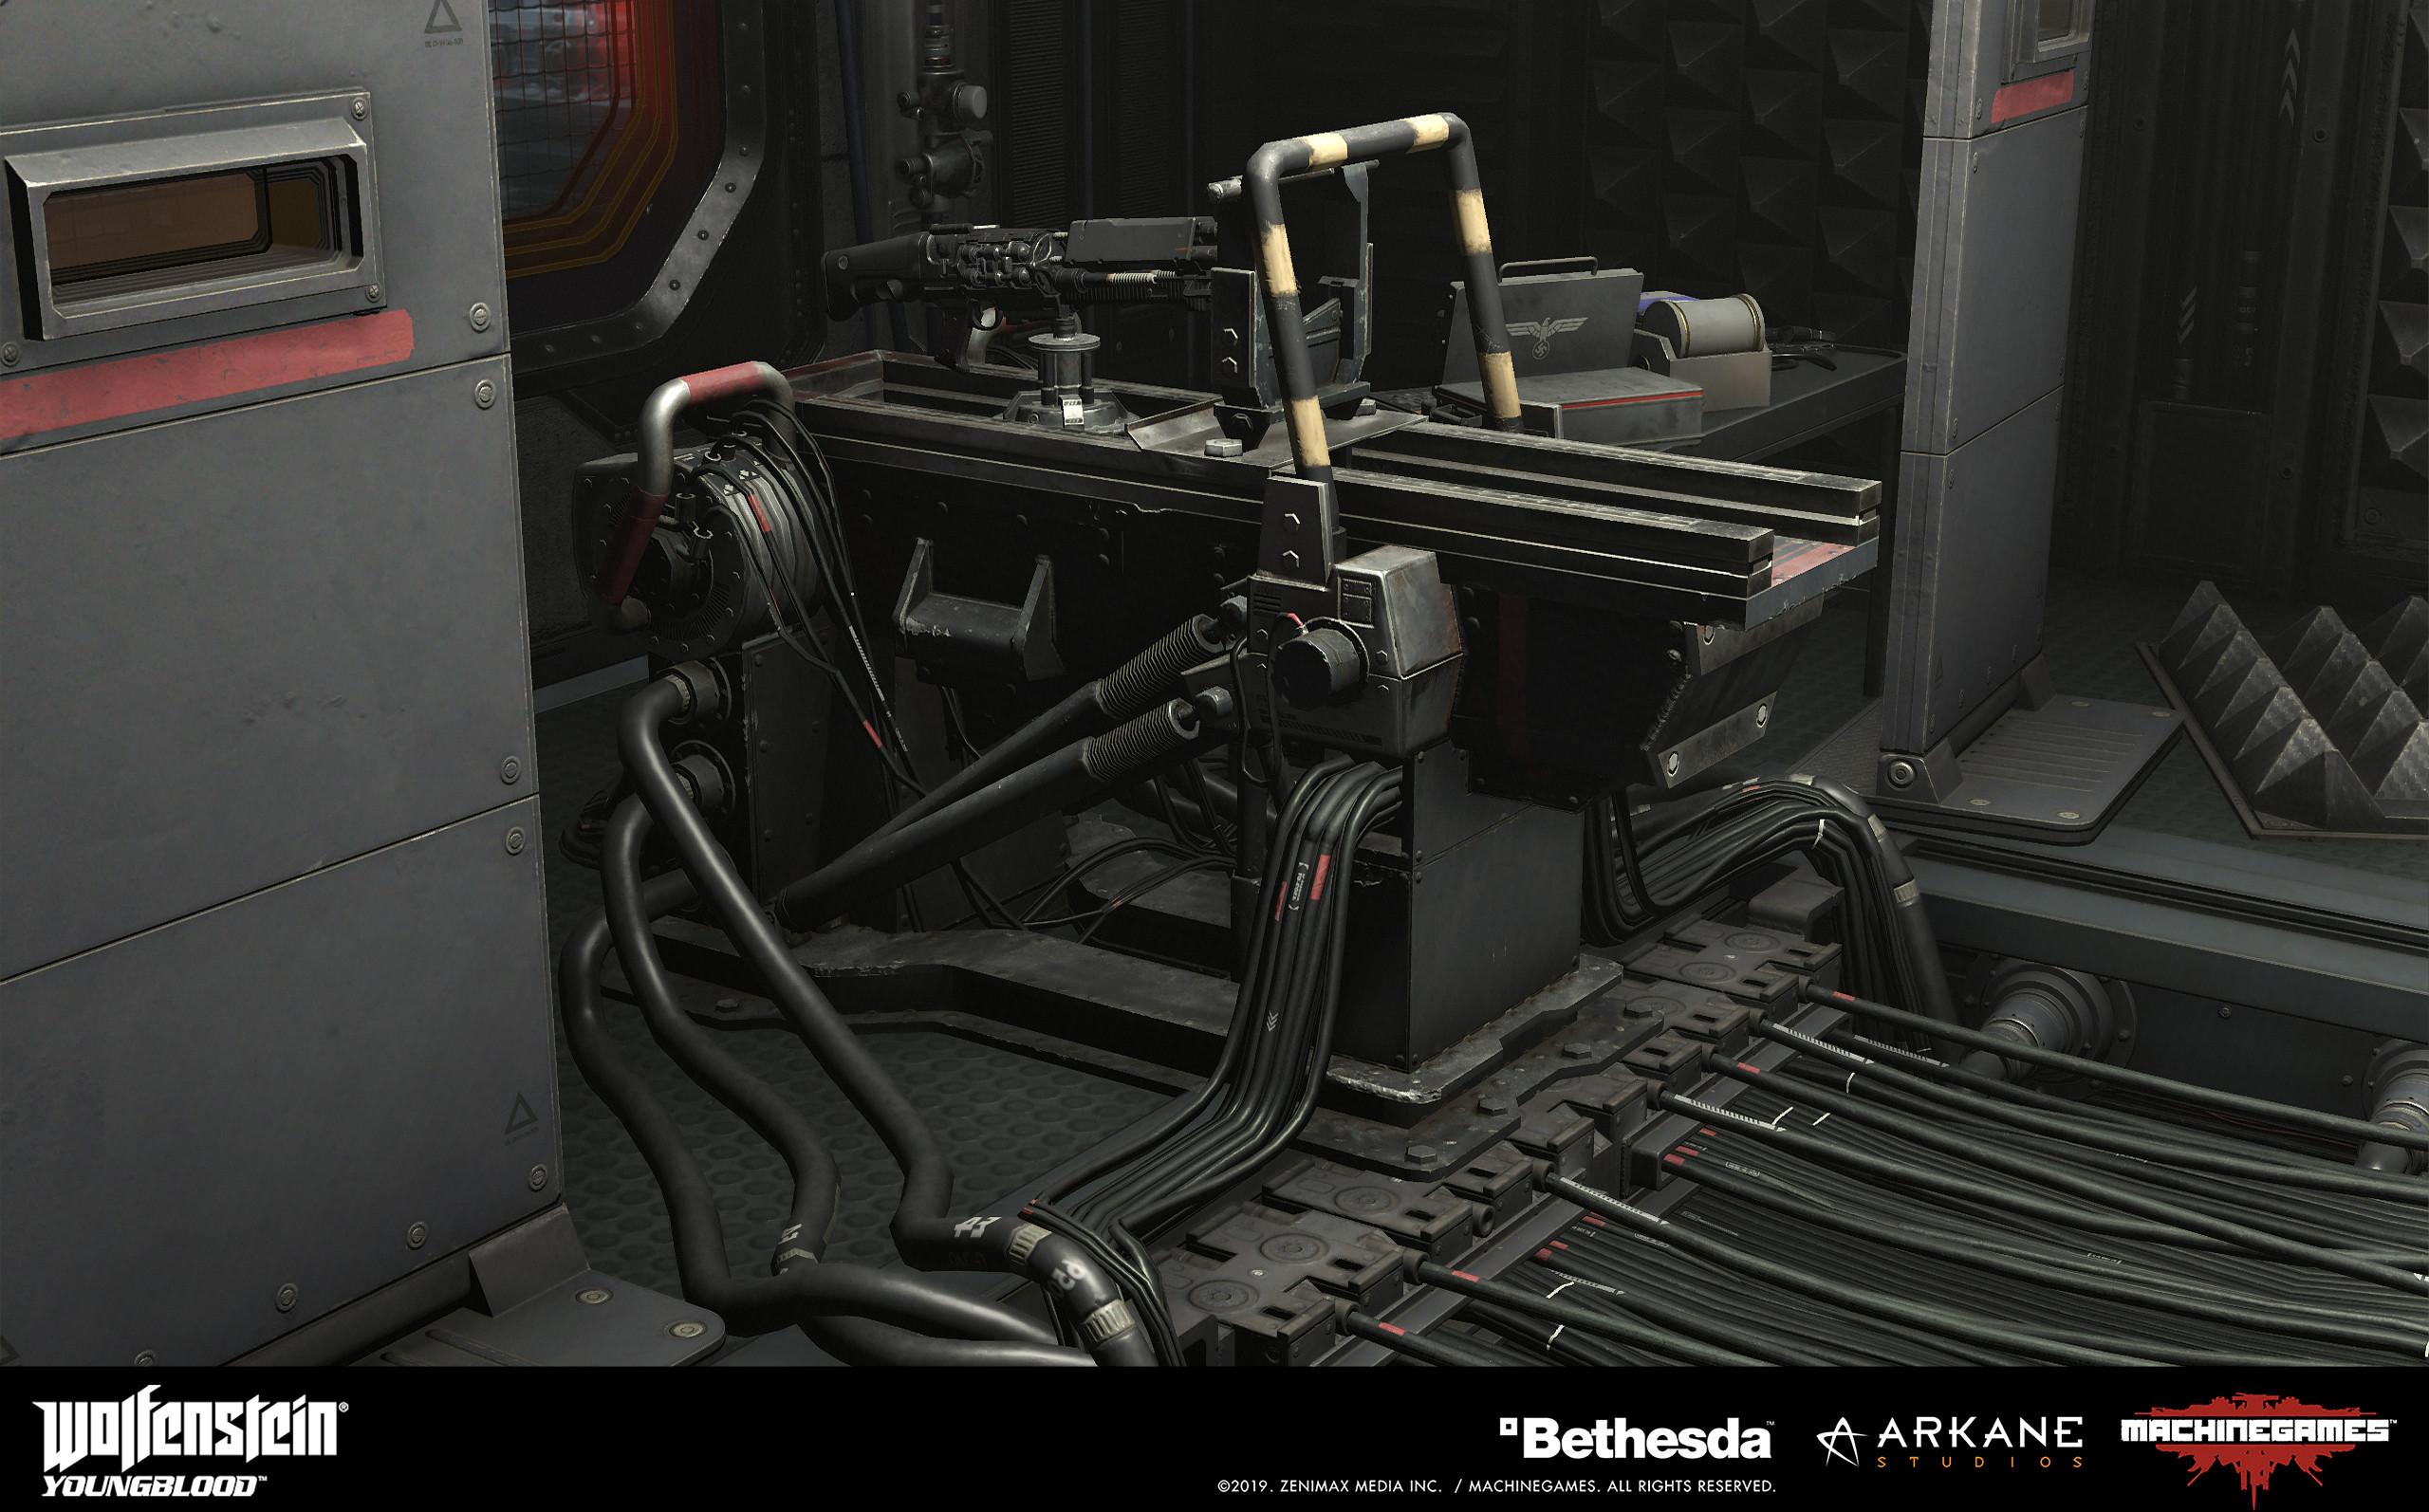 Electrogewhr test bench